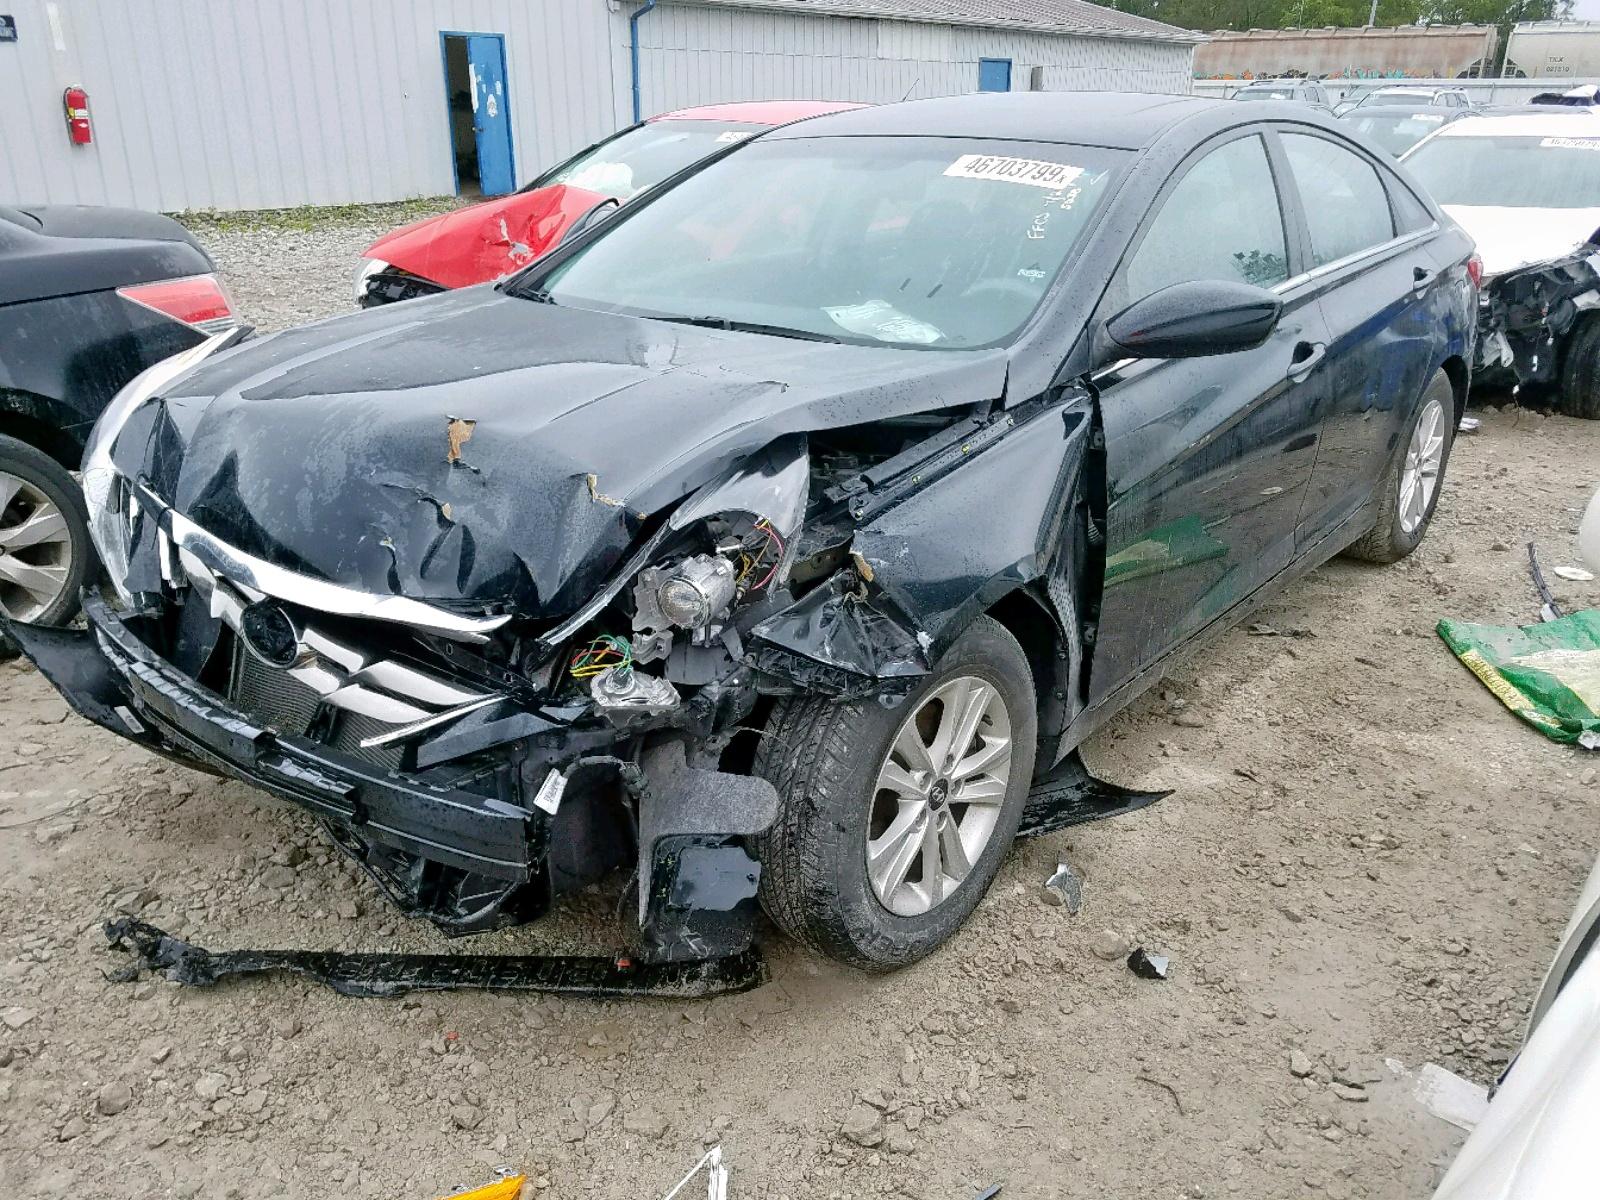 2013 Hyundai Sonata Gls 2.4L Right View